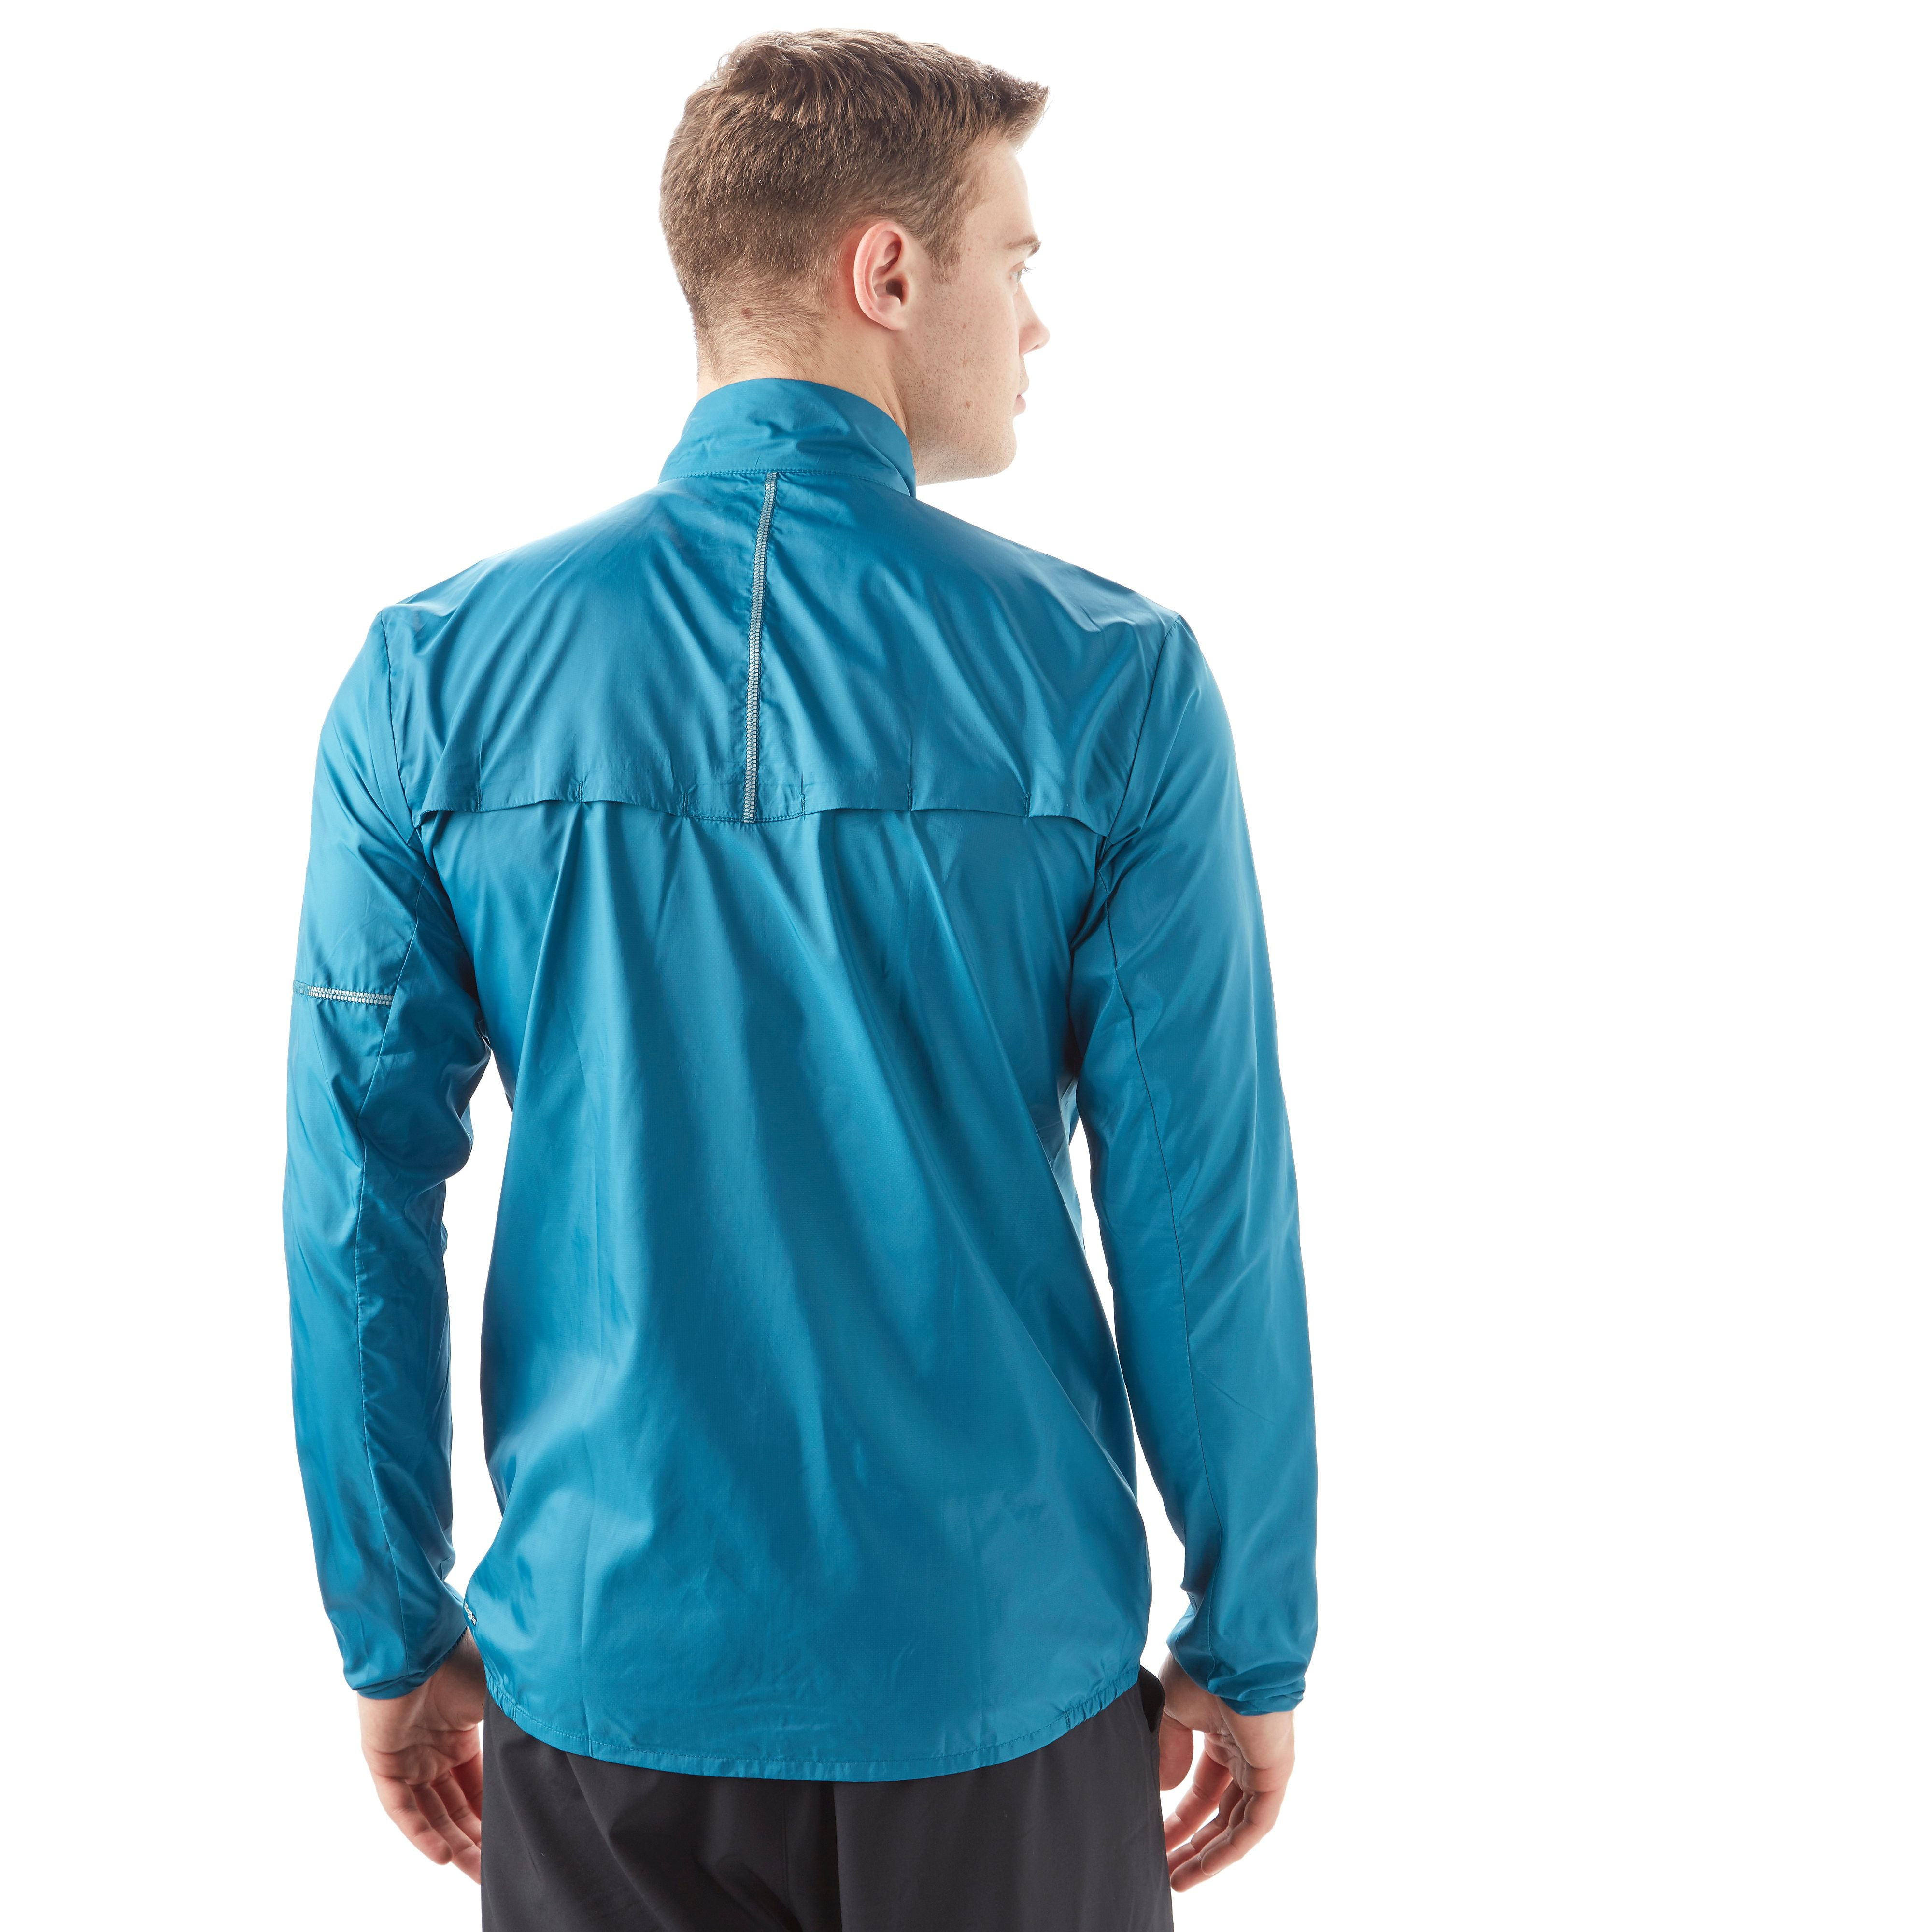 Salomon Agile Wind Men's Trail Training Jacket